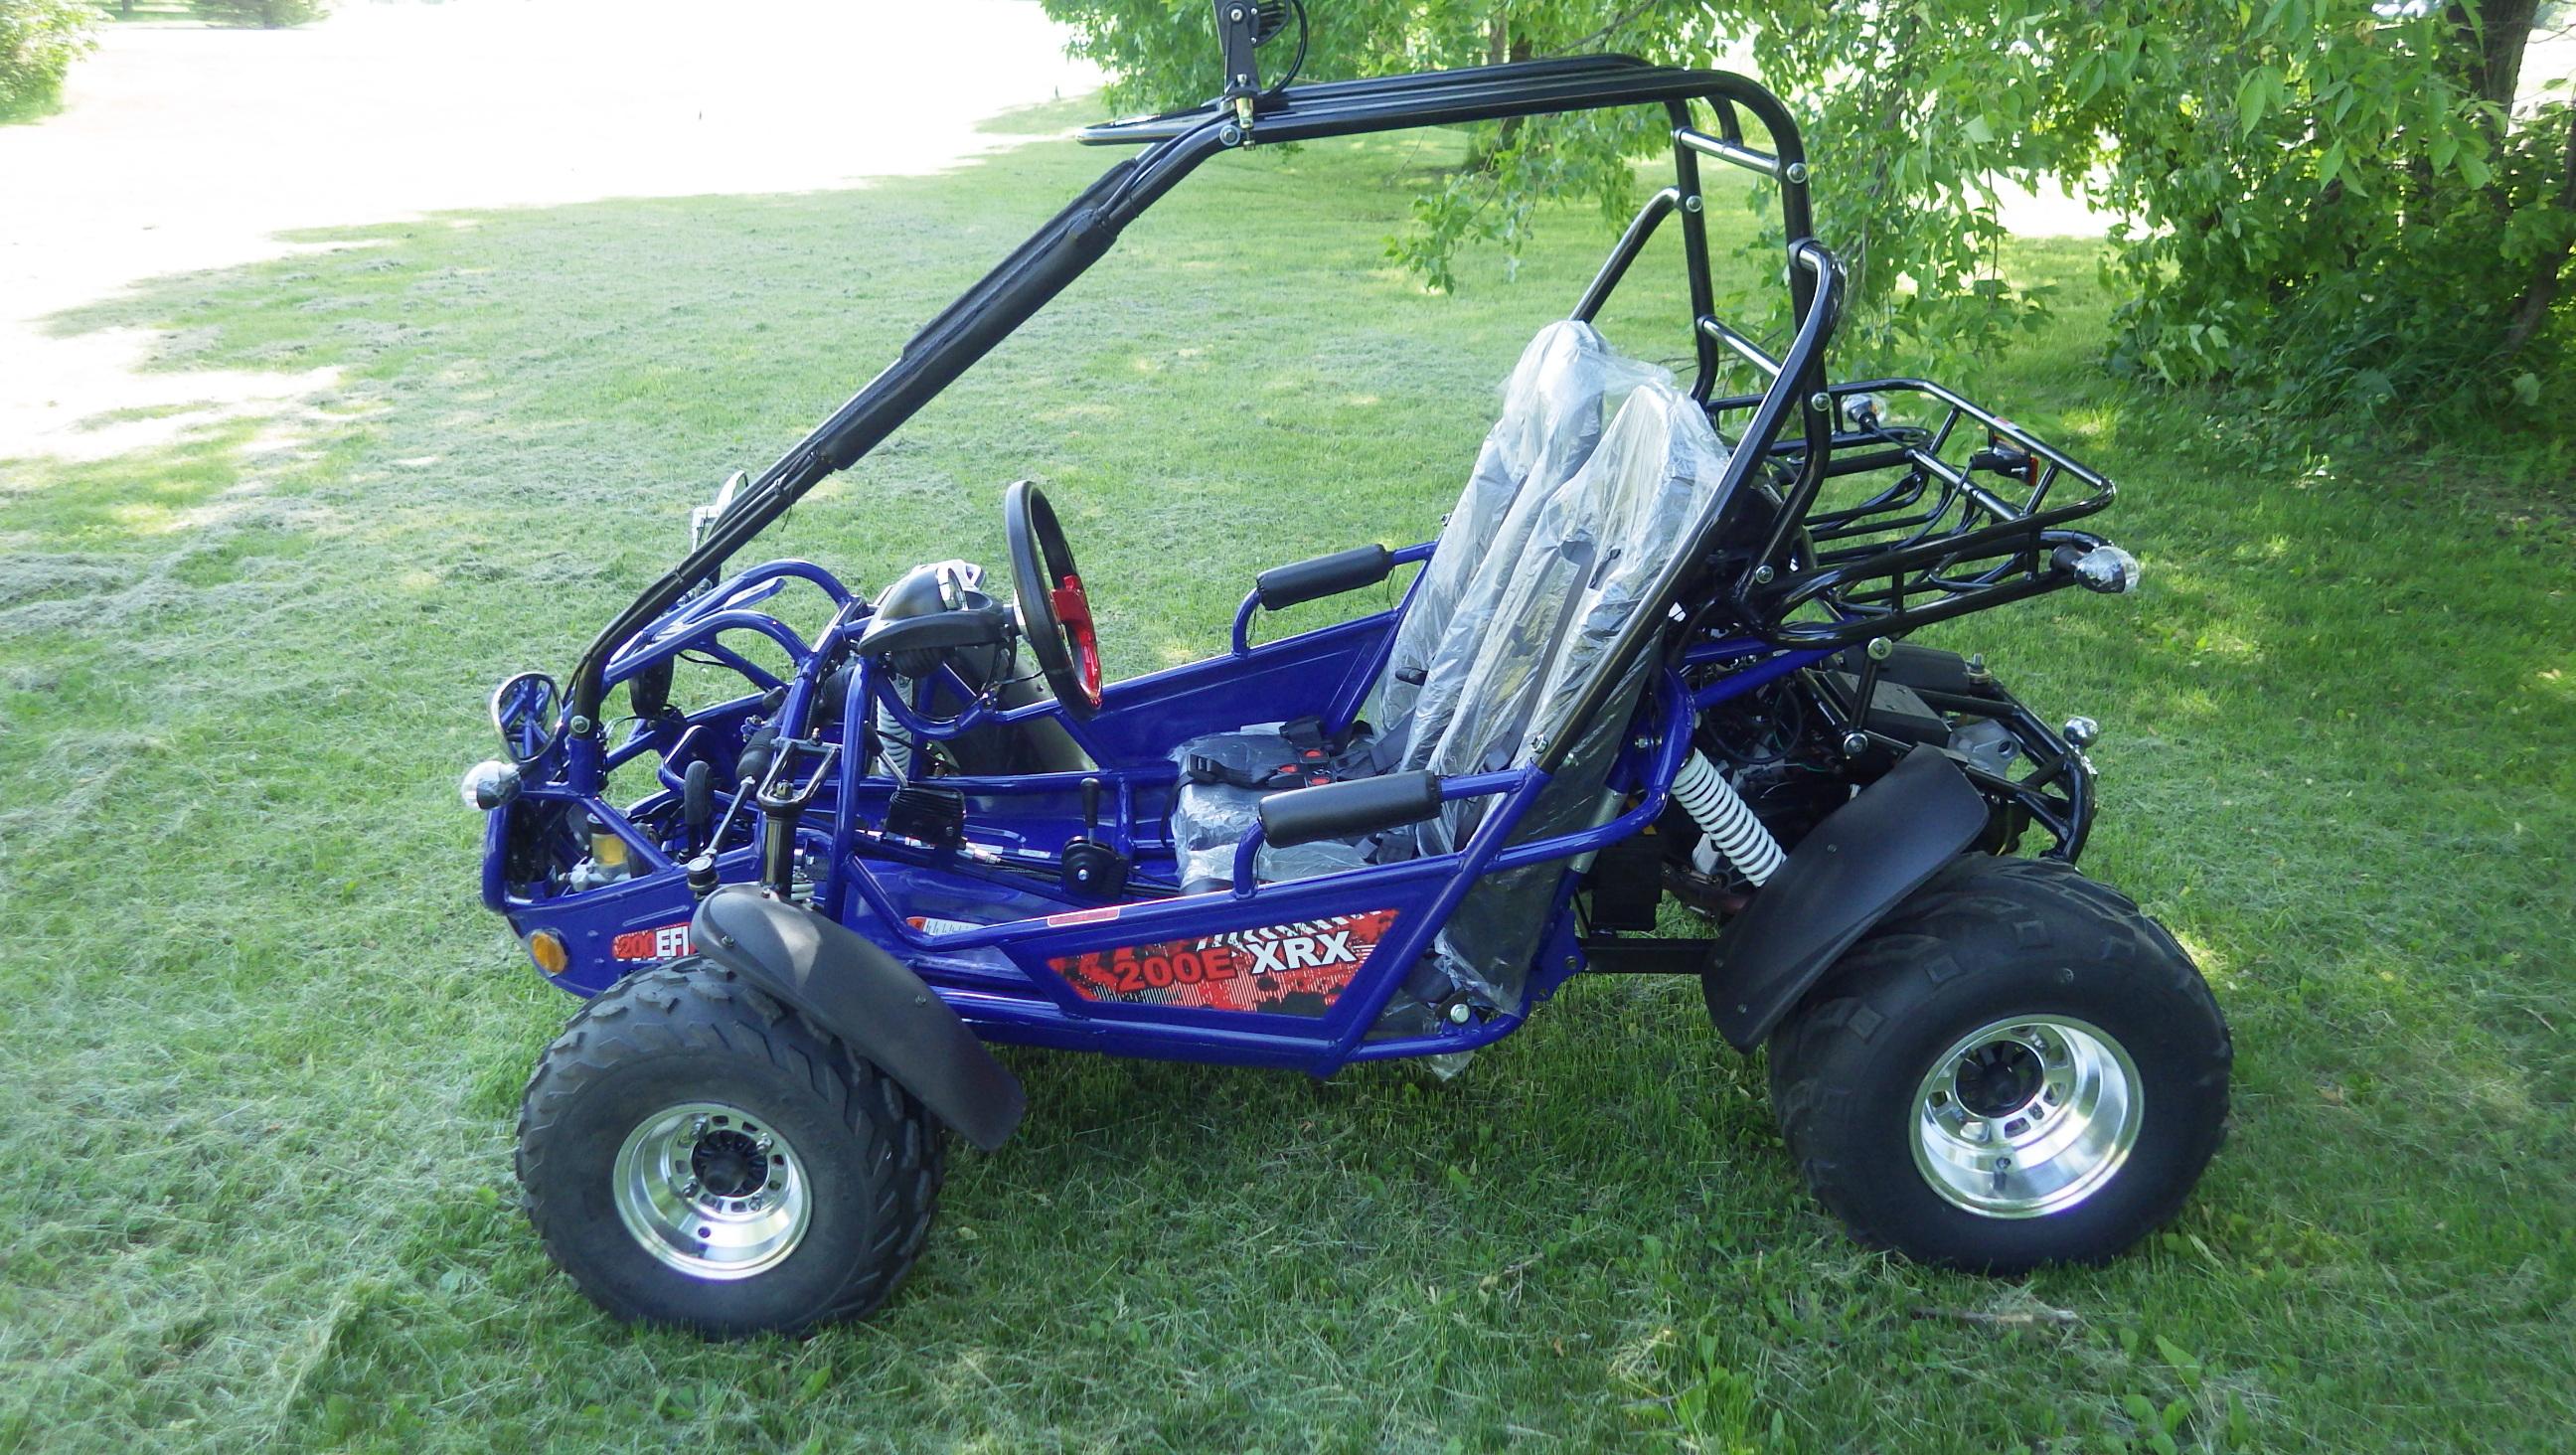 TrailMaster 200 E-XRX Blue3